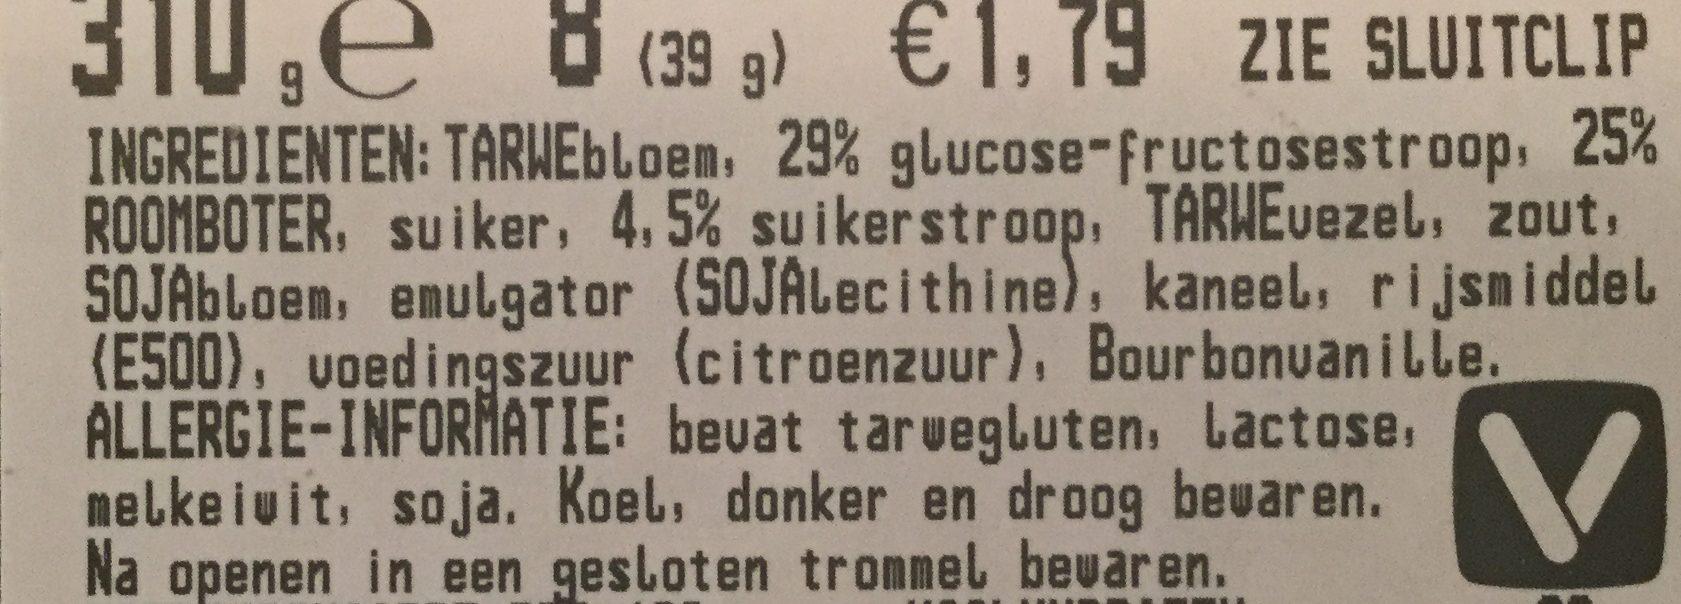 Stroopwafels - Ingrediënten